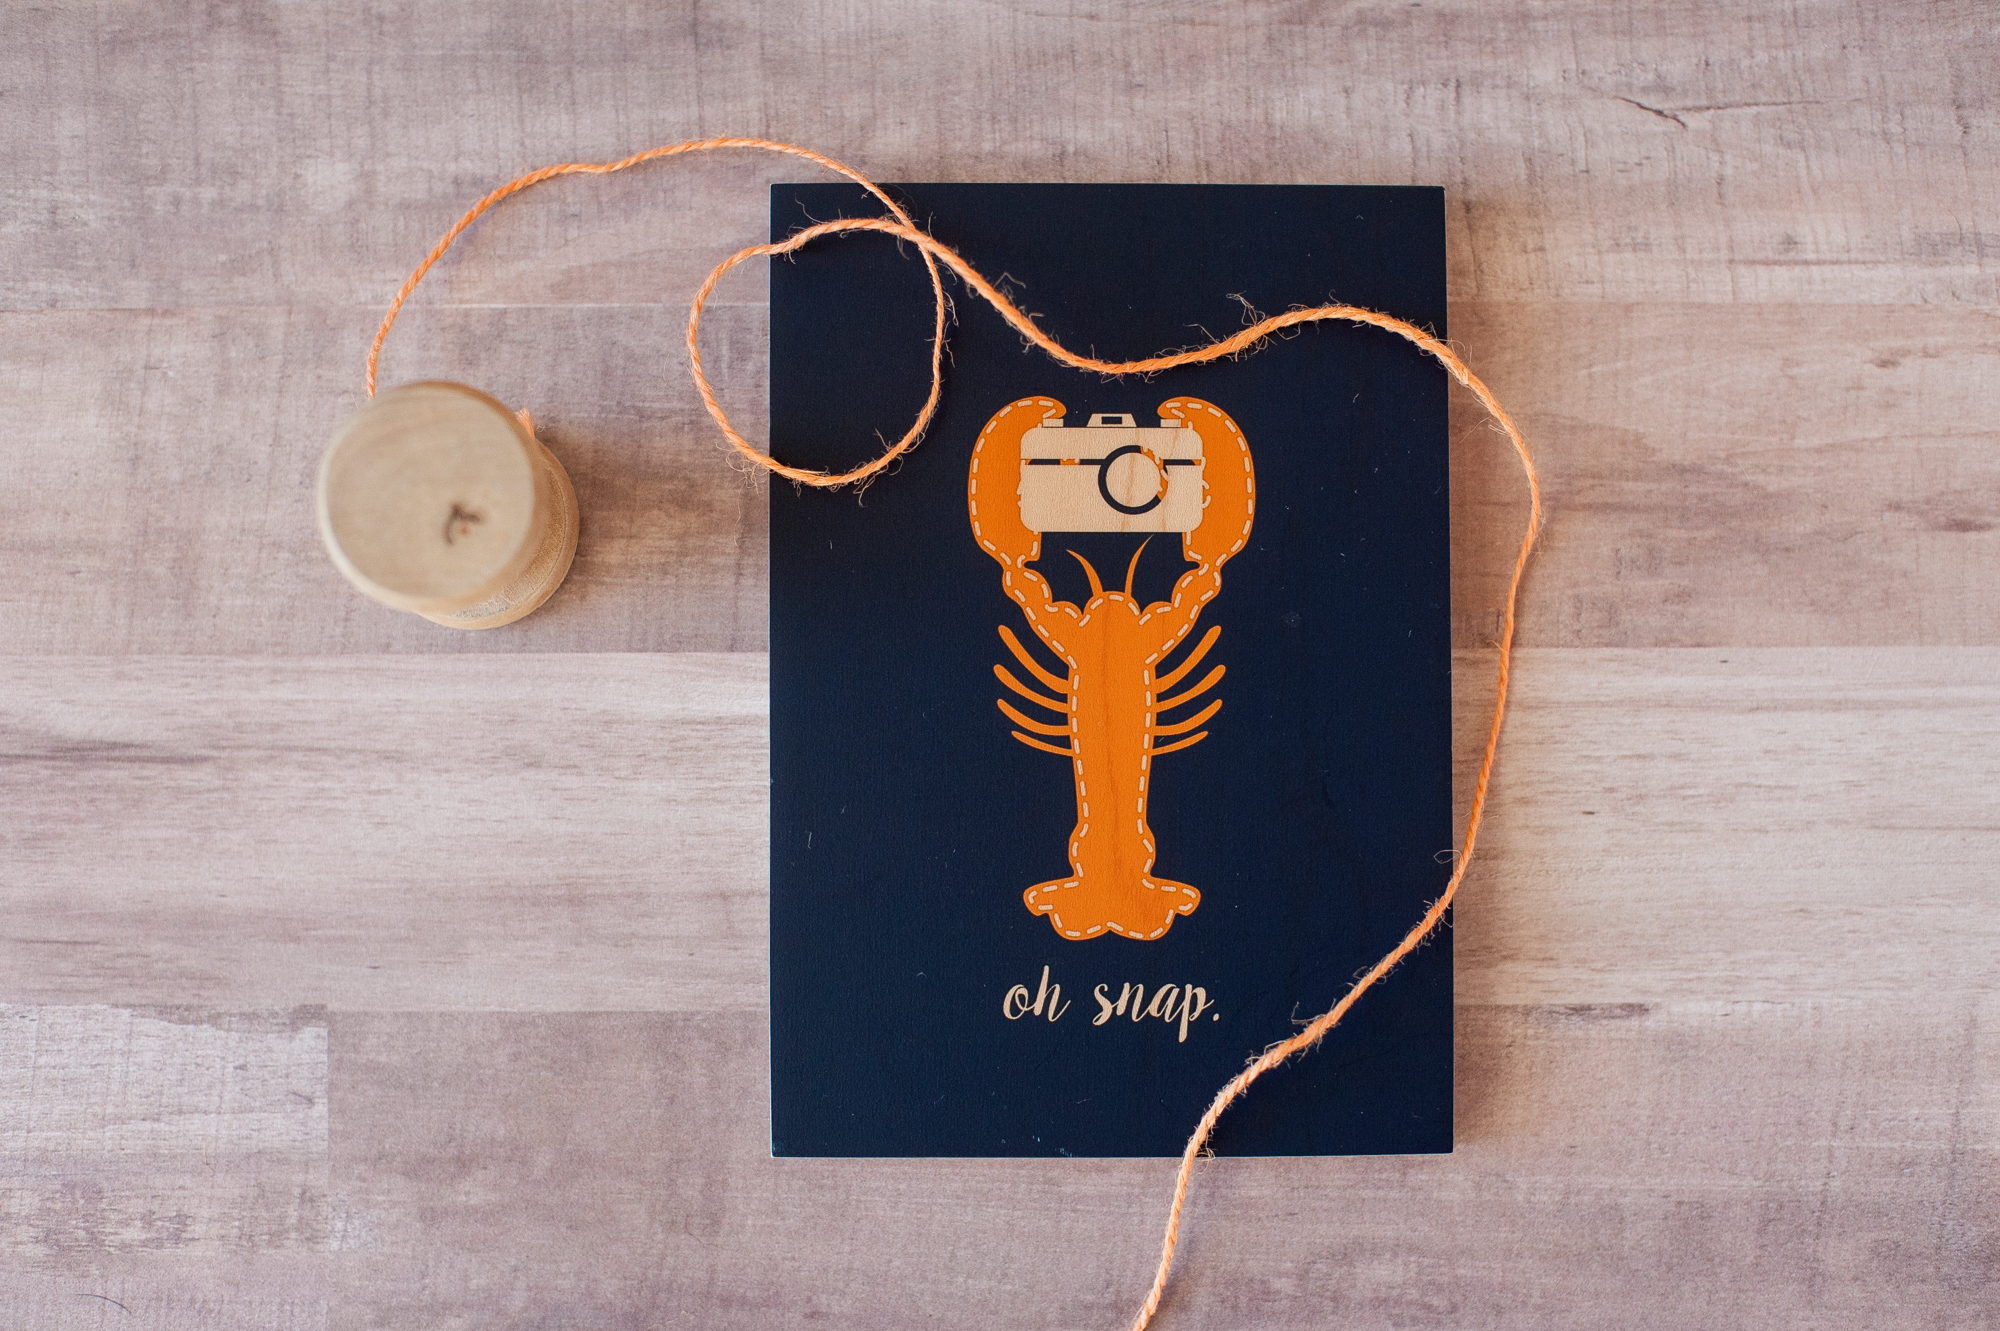 custom lobster art from a friend